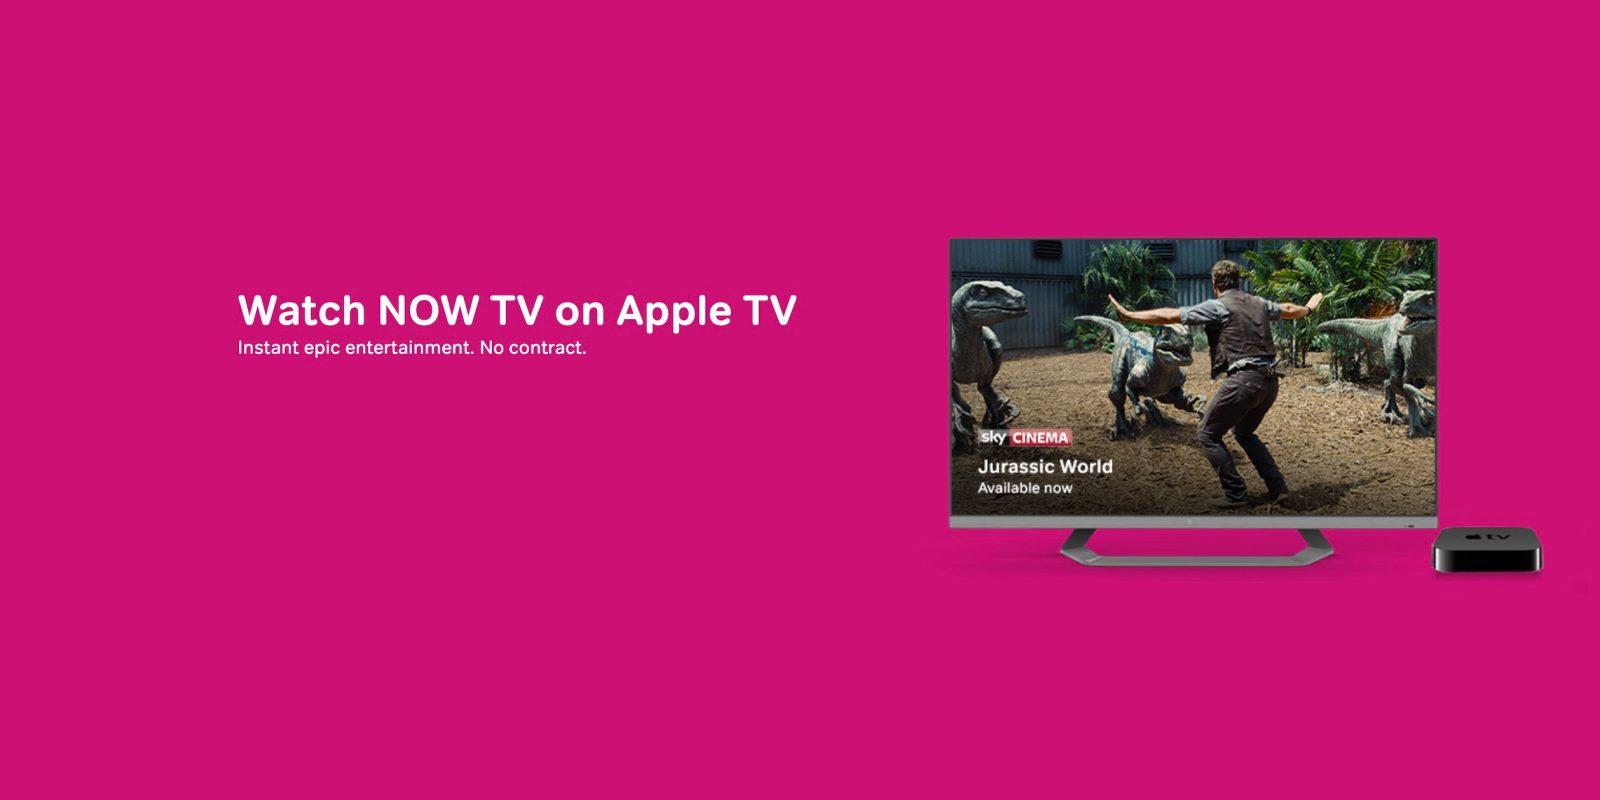 UK streaming service NOW TV testing new tvOS app for Apple